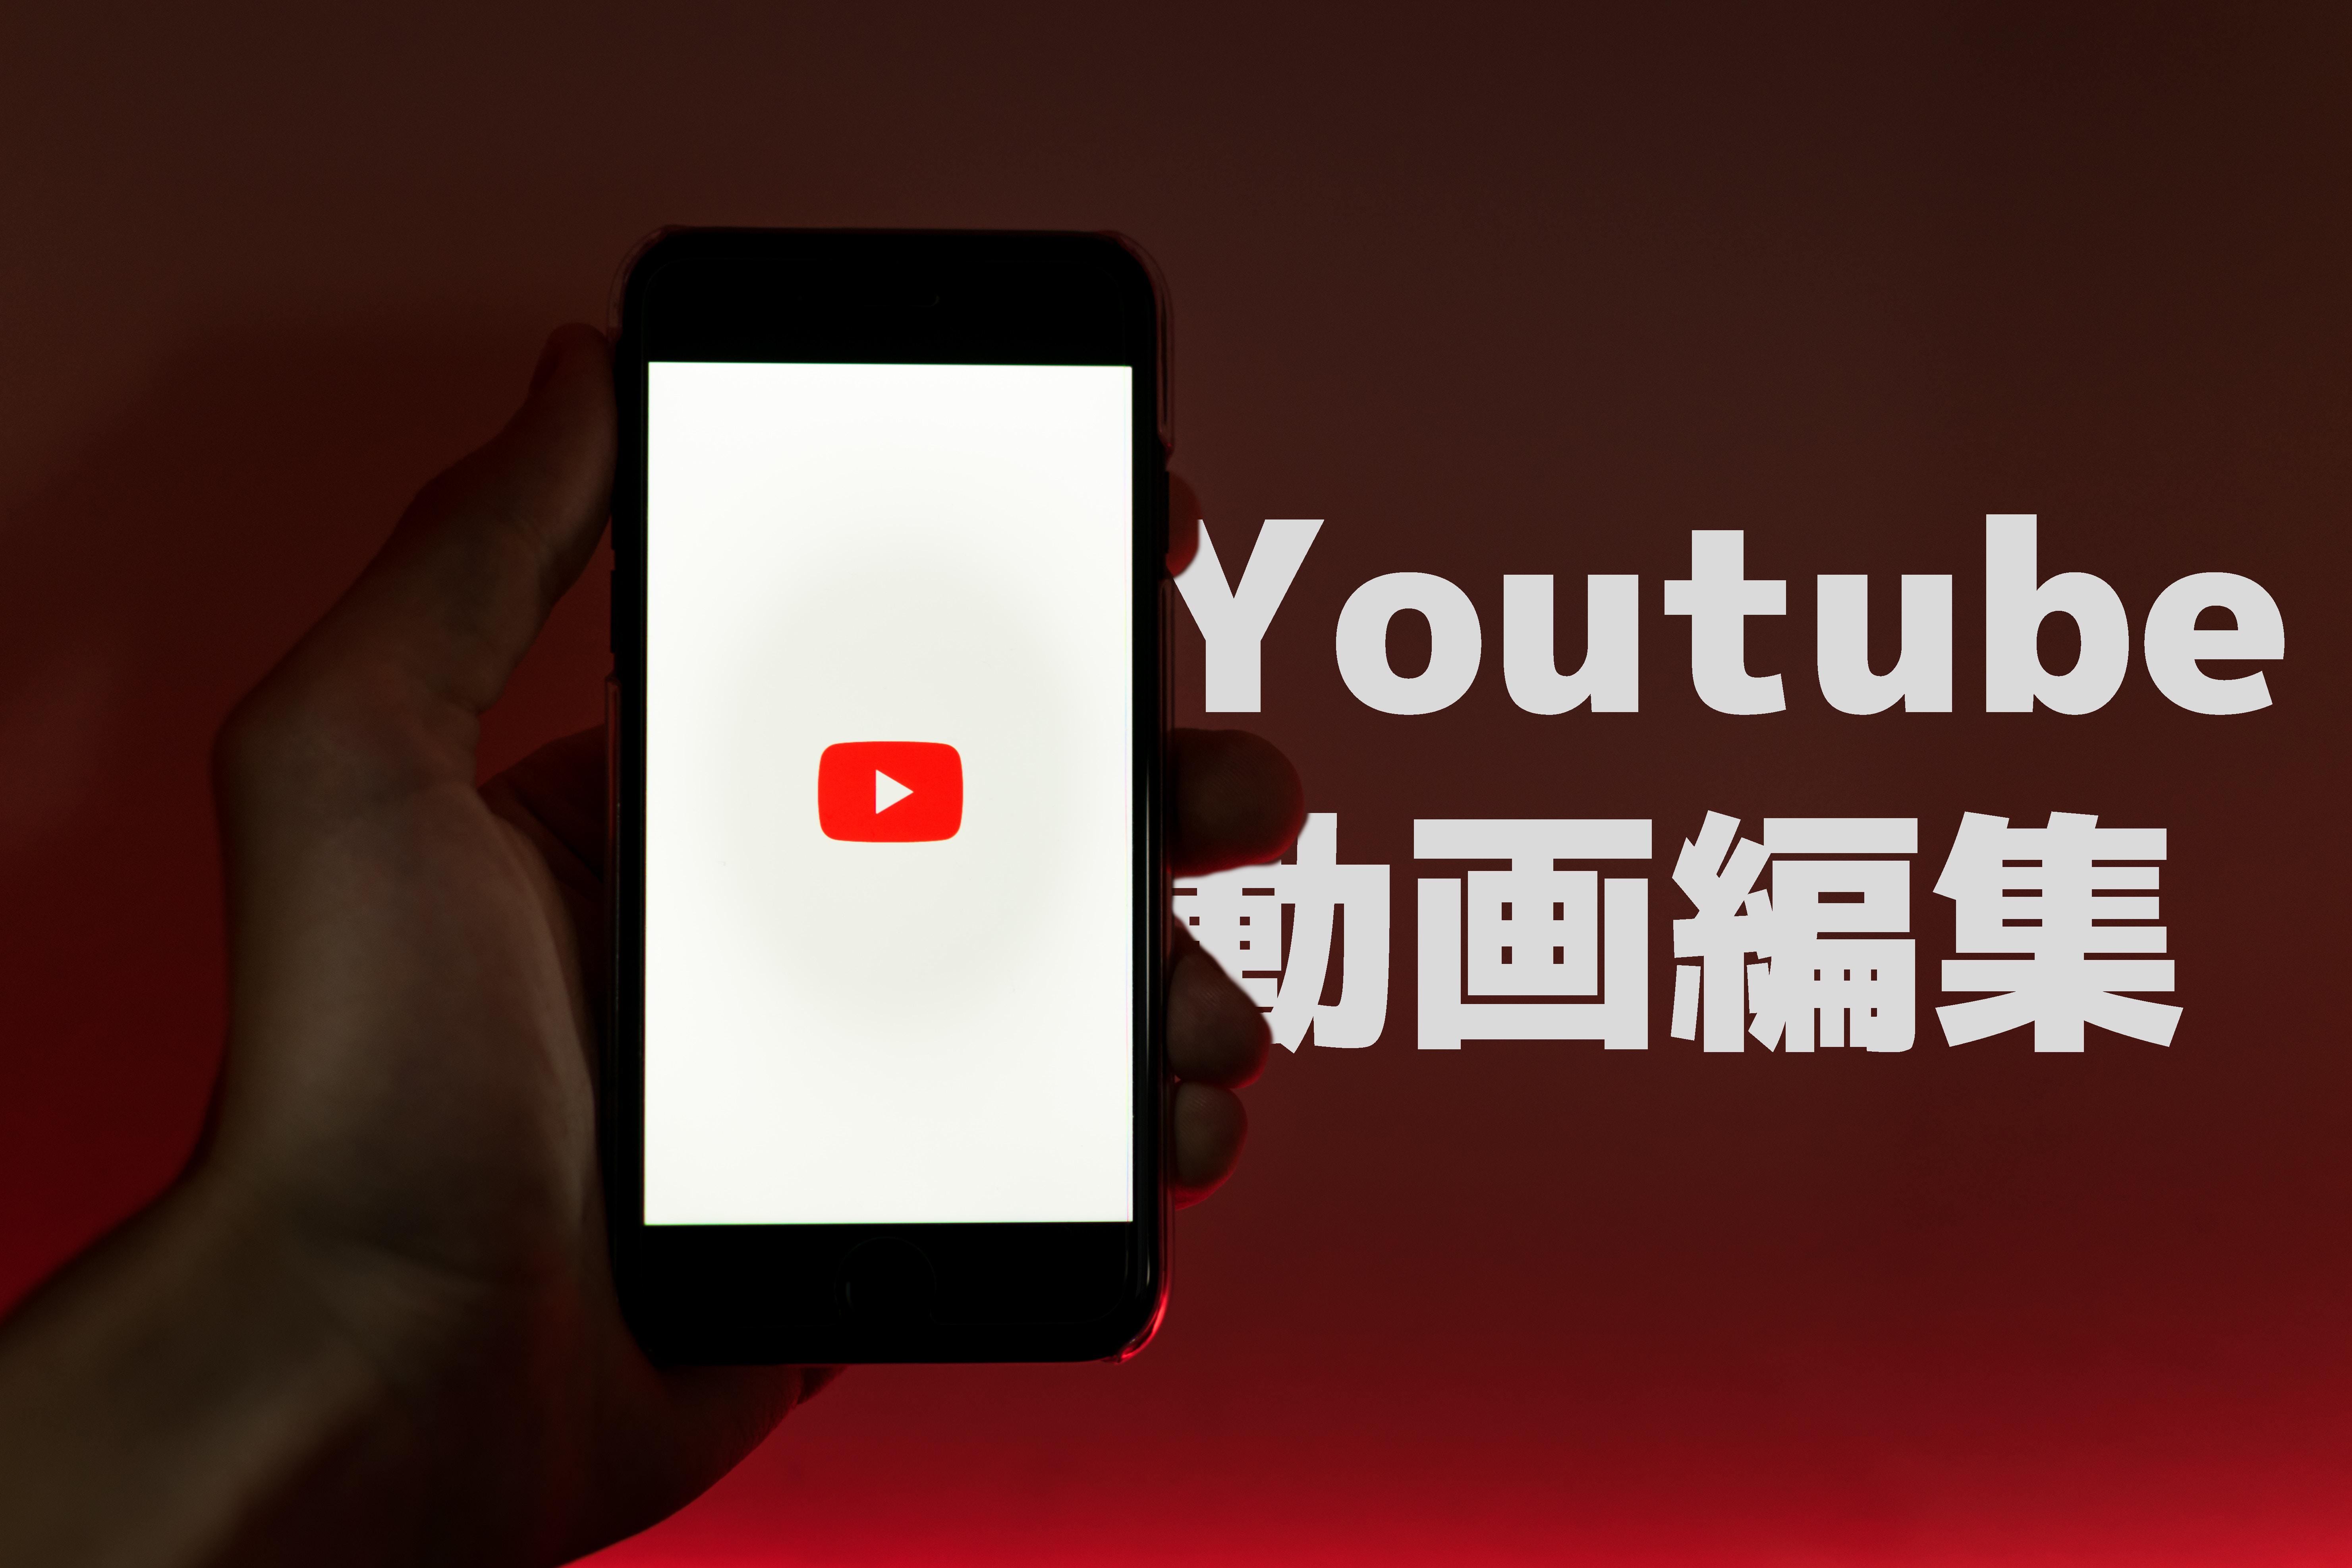 YouTube向けの動画編集承ります 長い編集時間を削減!動画撮影に時間を割けます!